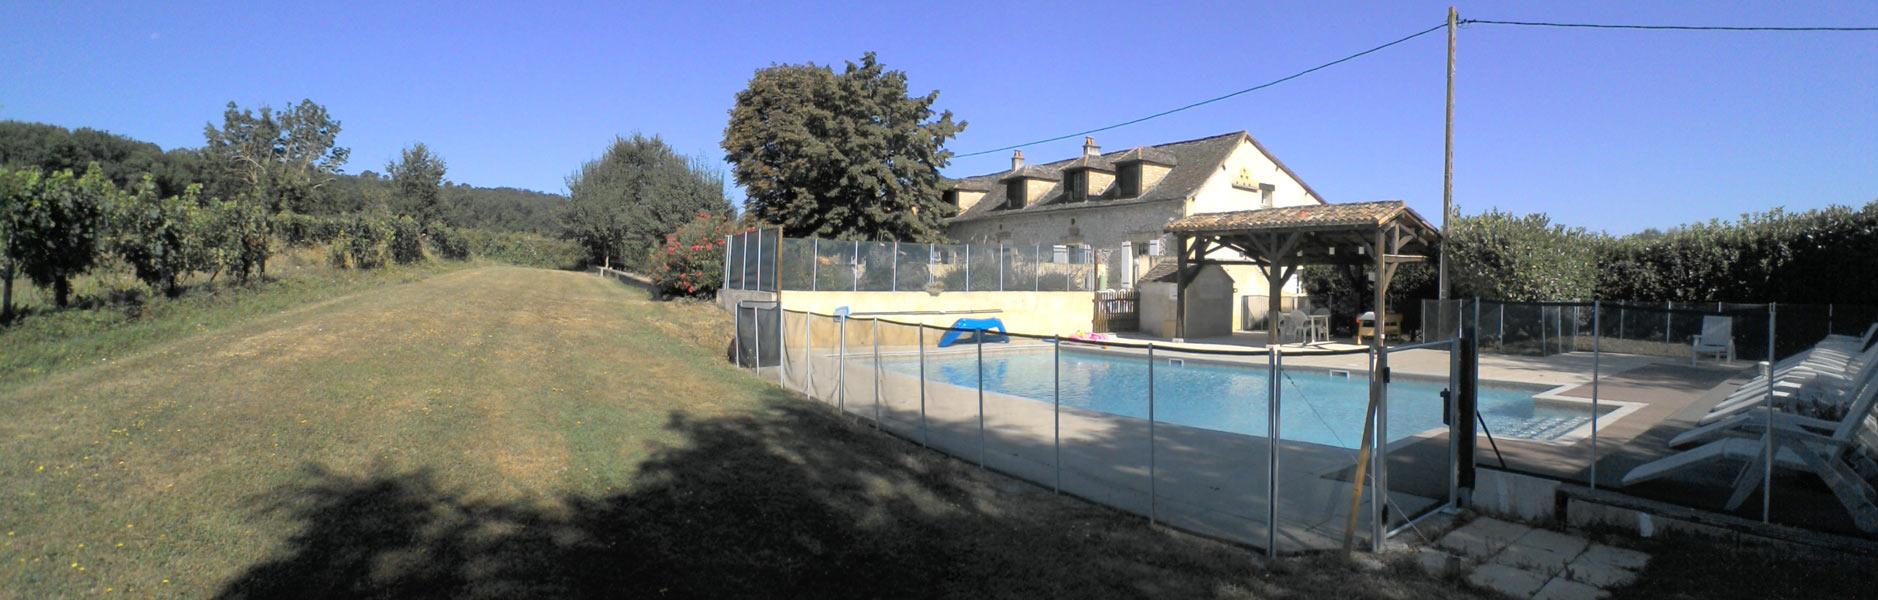 piscine-sud_Panorama00